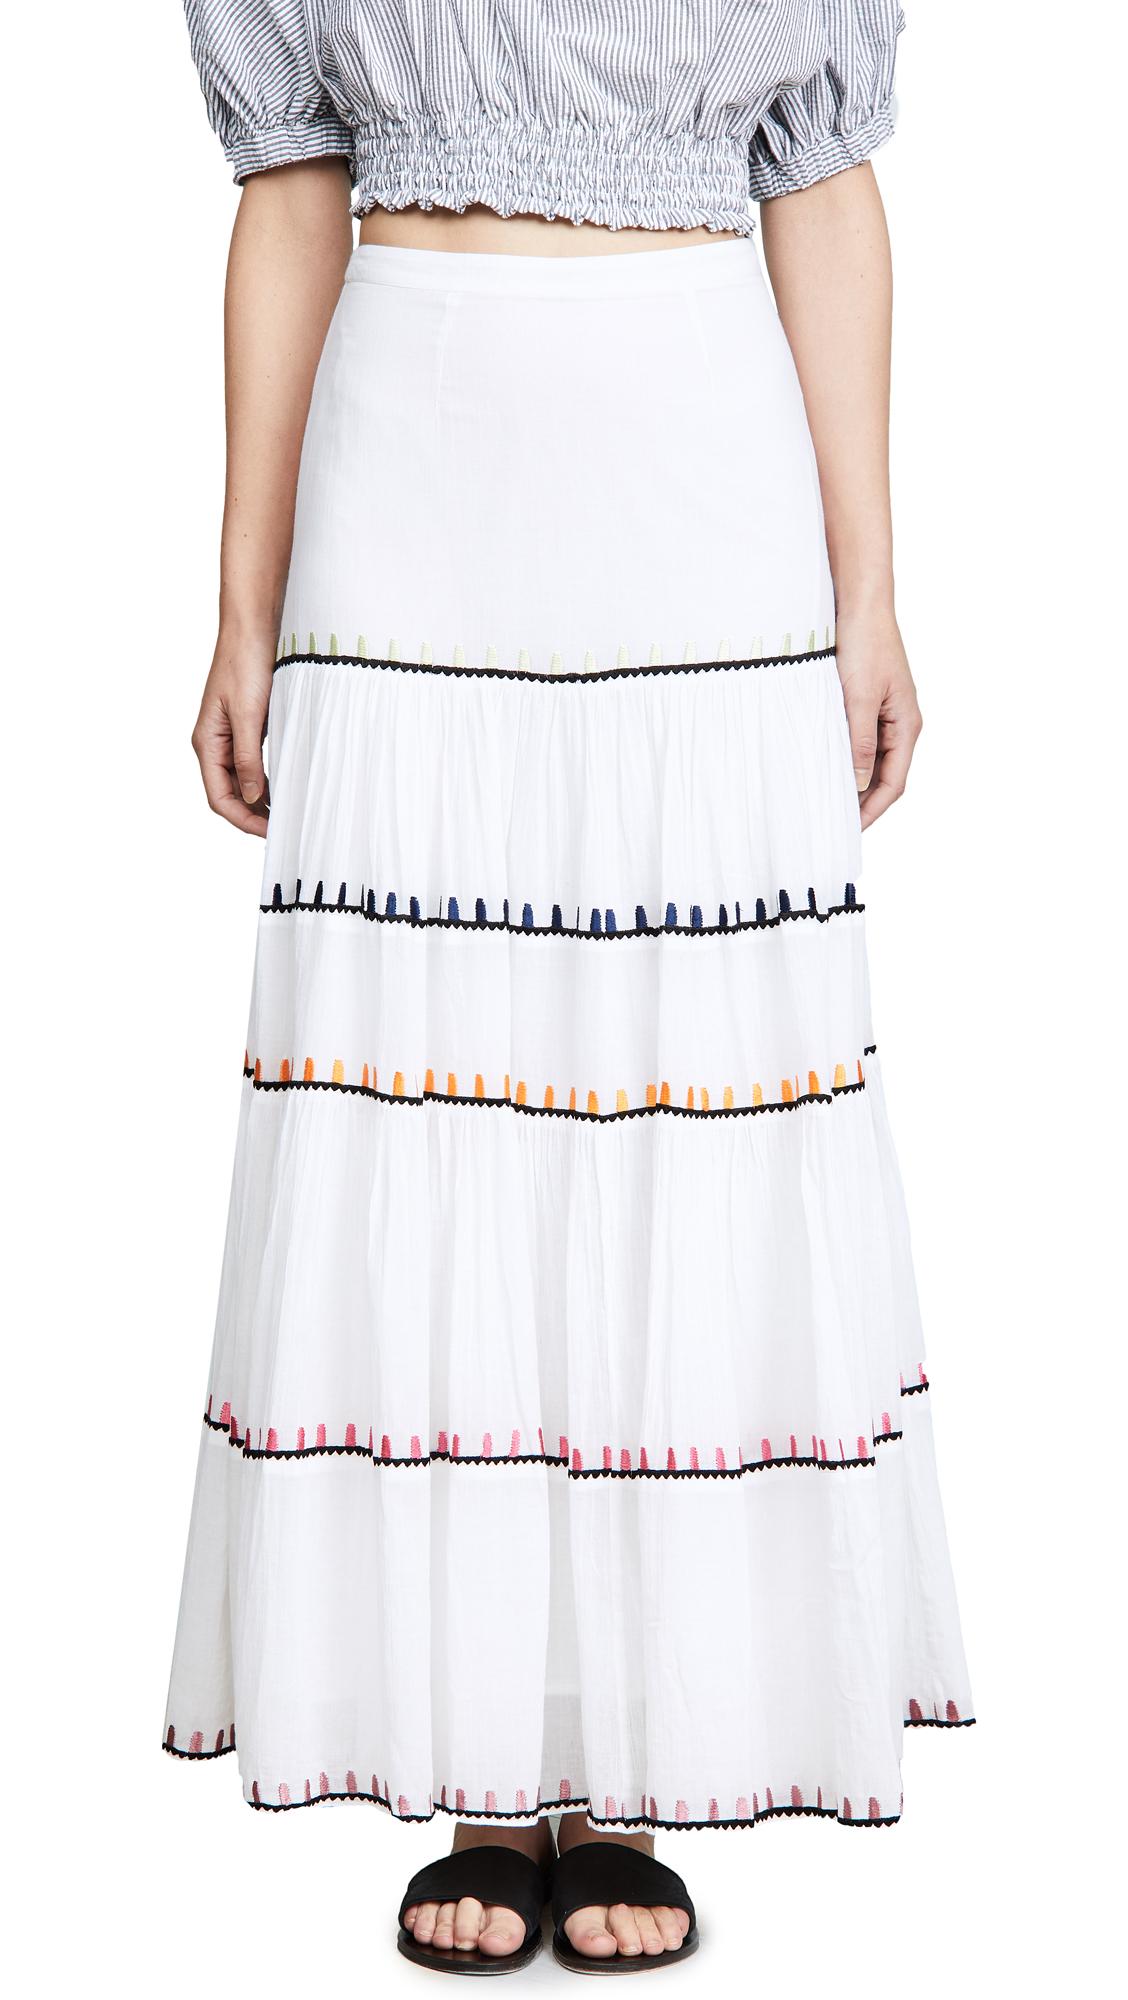 Carolina K Iris Skirt